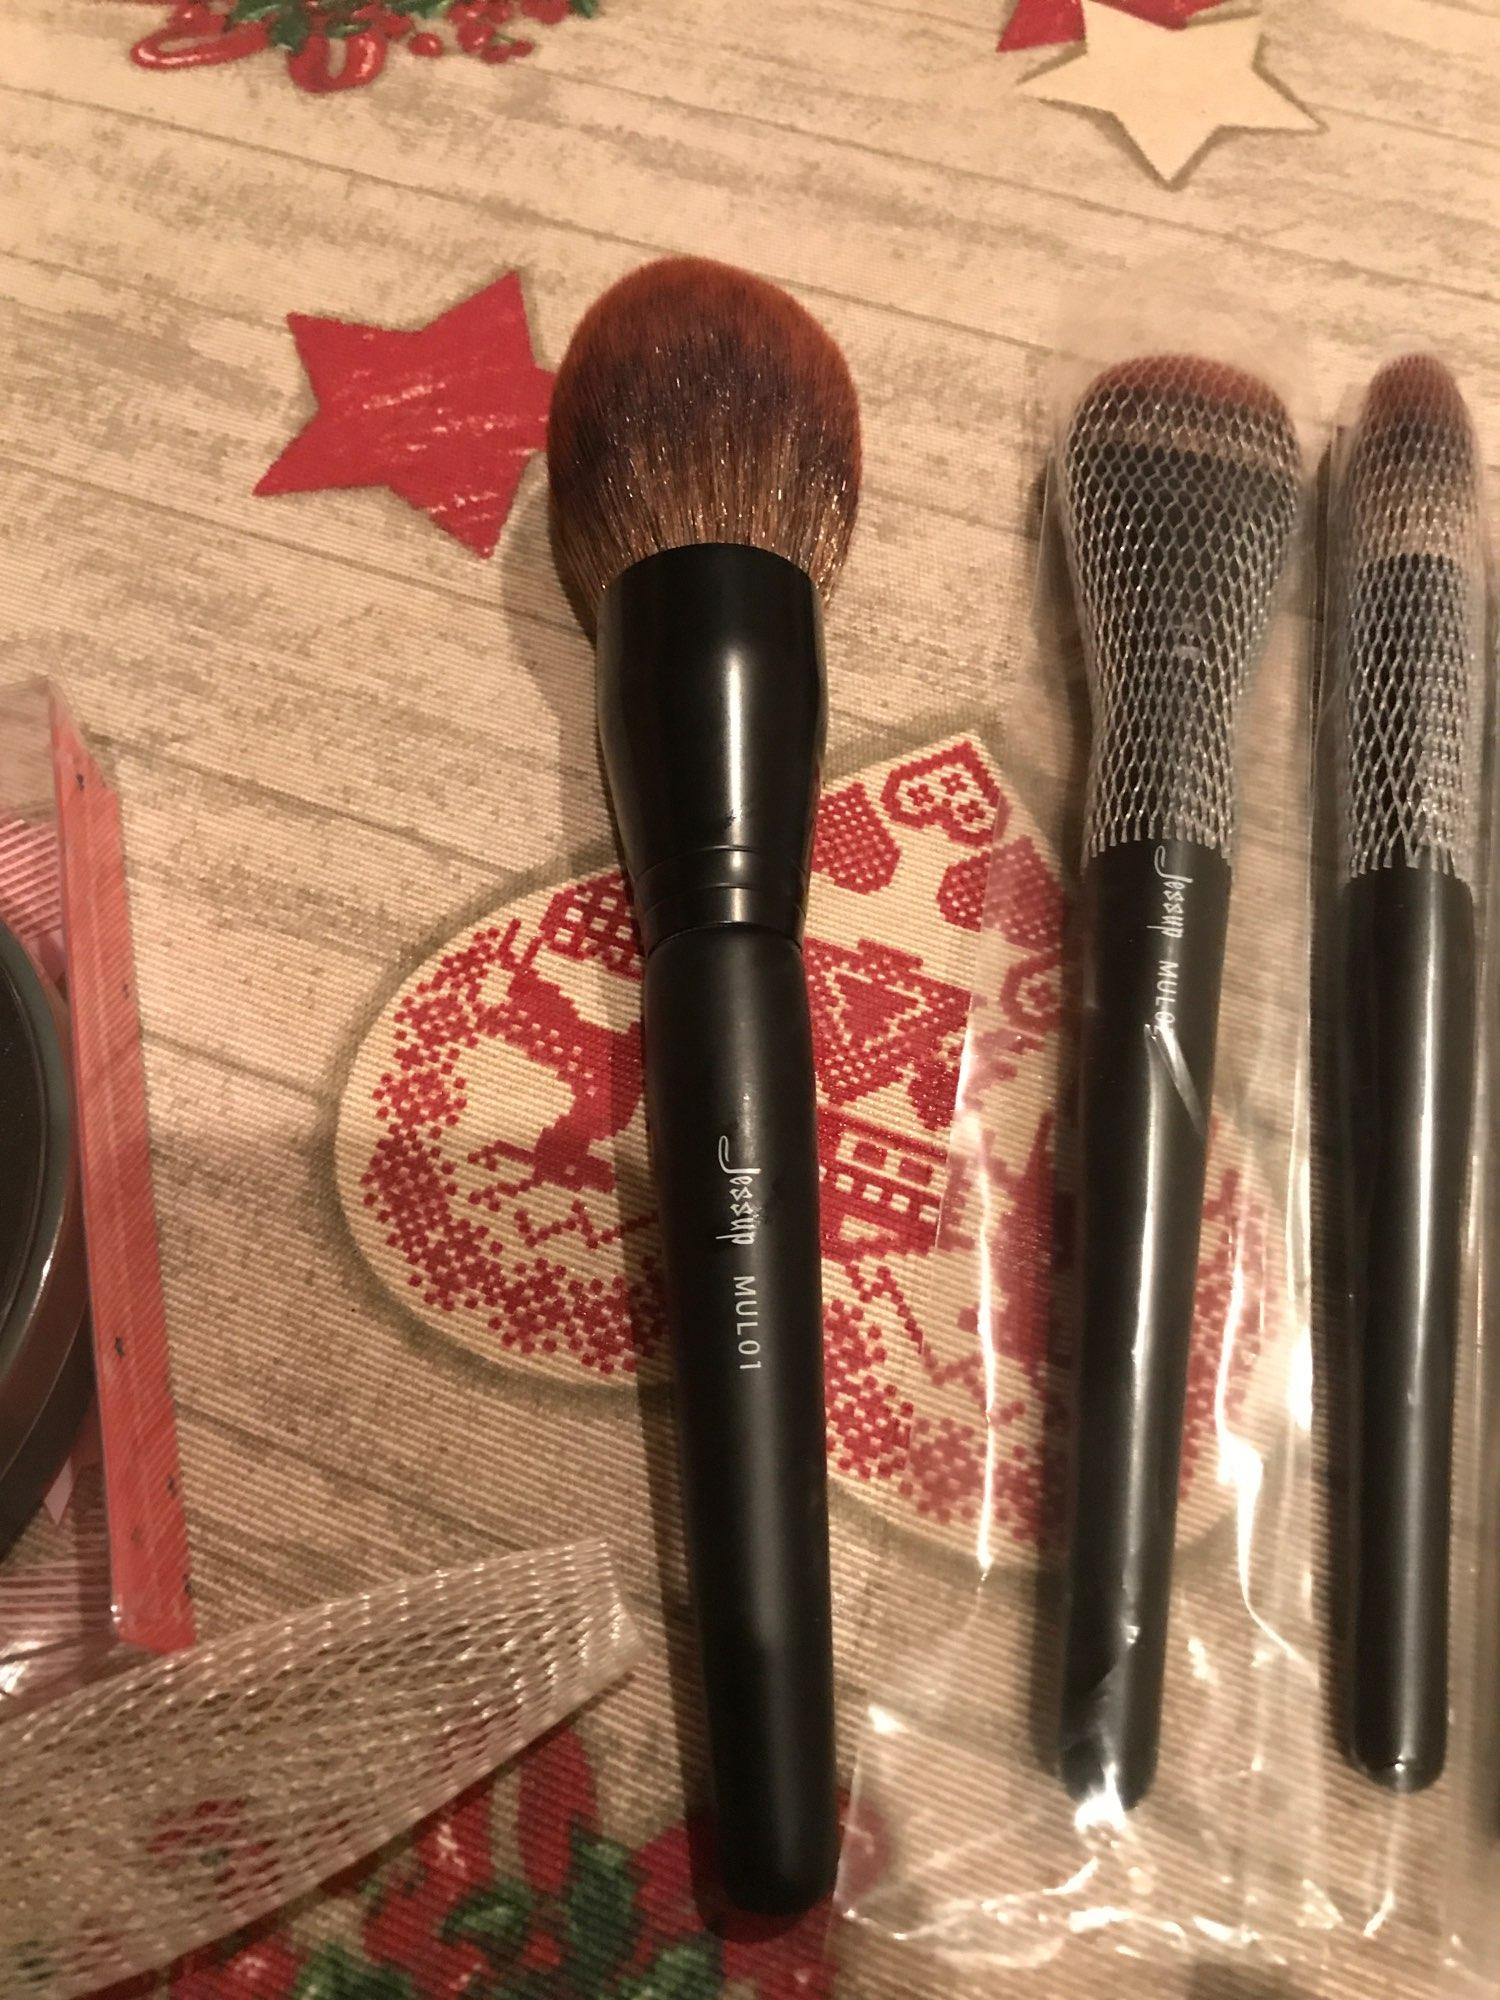 Jessup New Arrival Makeup brushes brushes Phantom Black 3-21pcs Foundation brush Powder Concealer Eyeshadow Synthetic hair reviews №4 235810